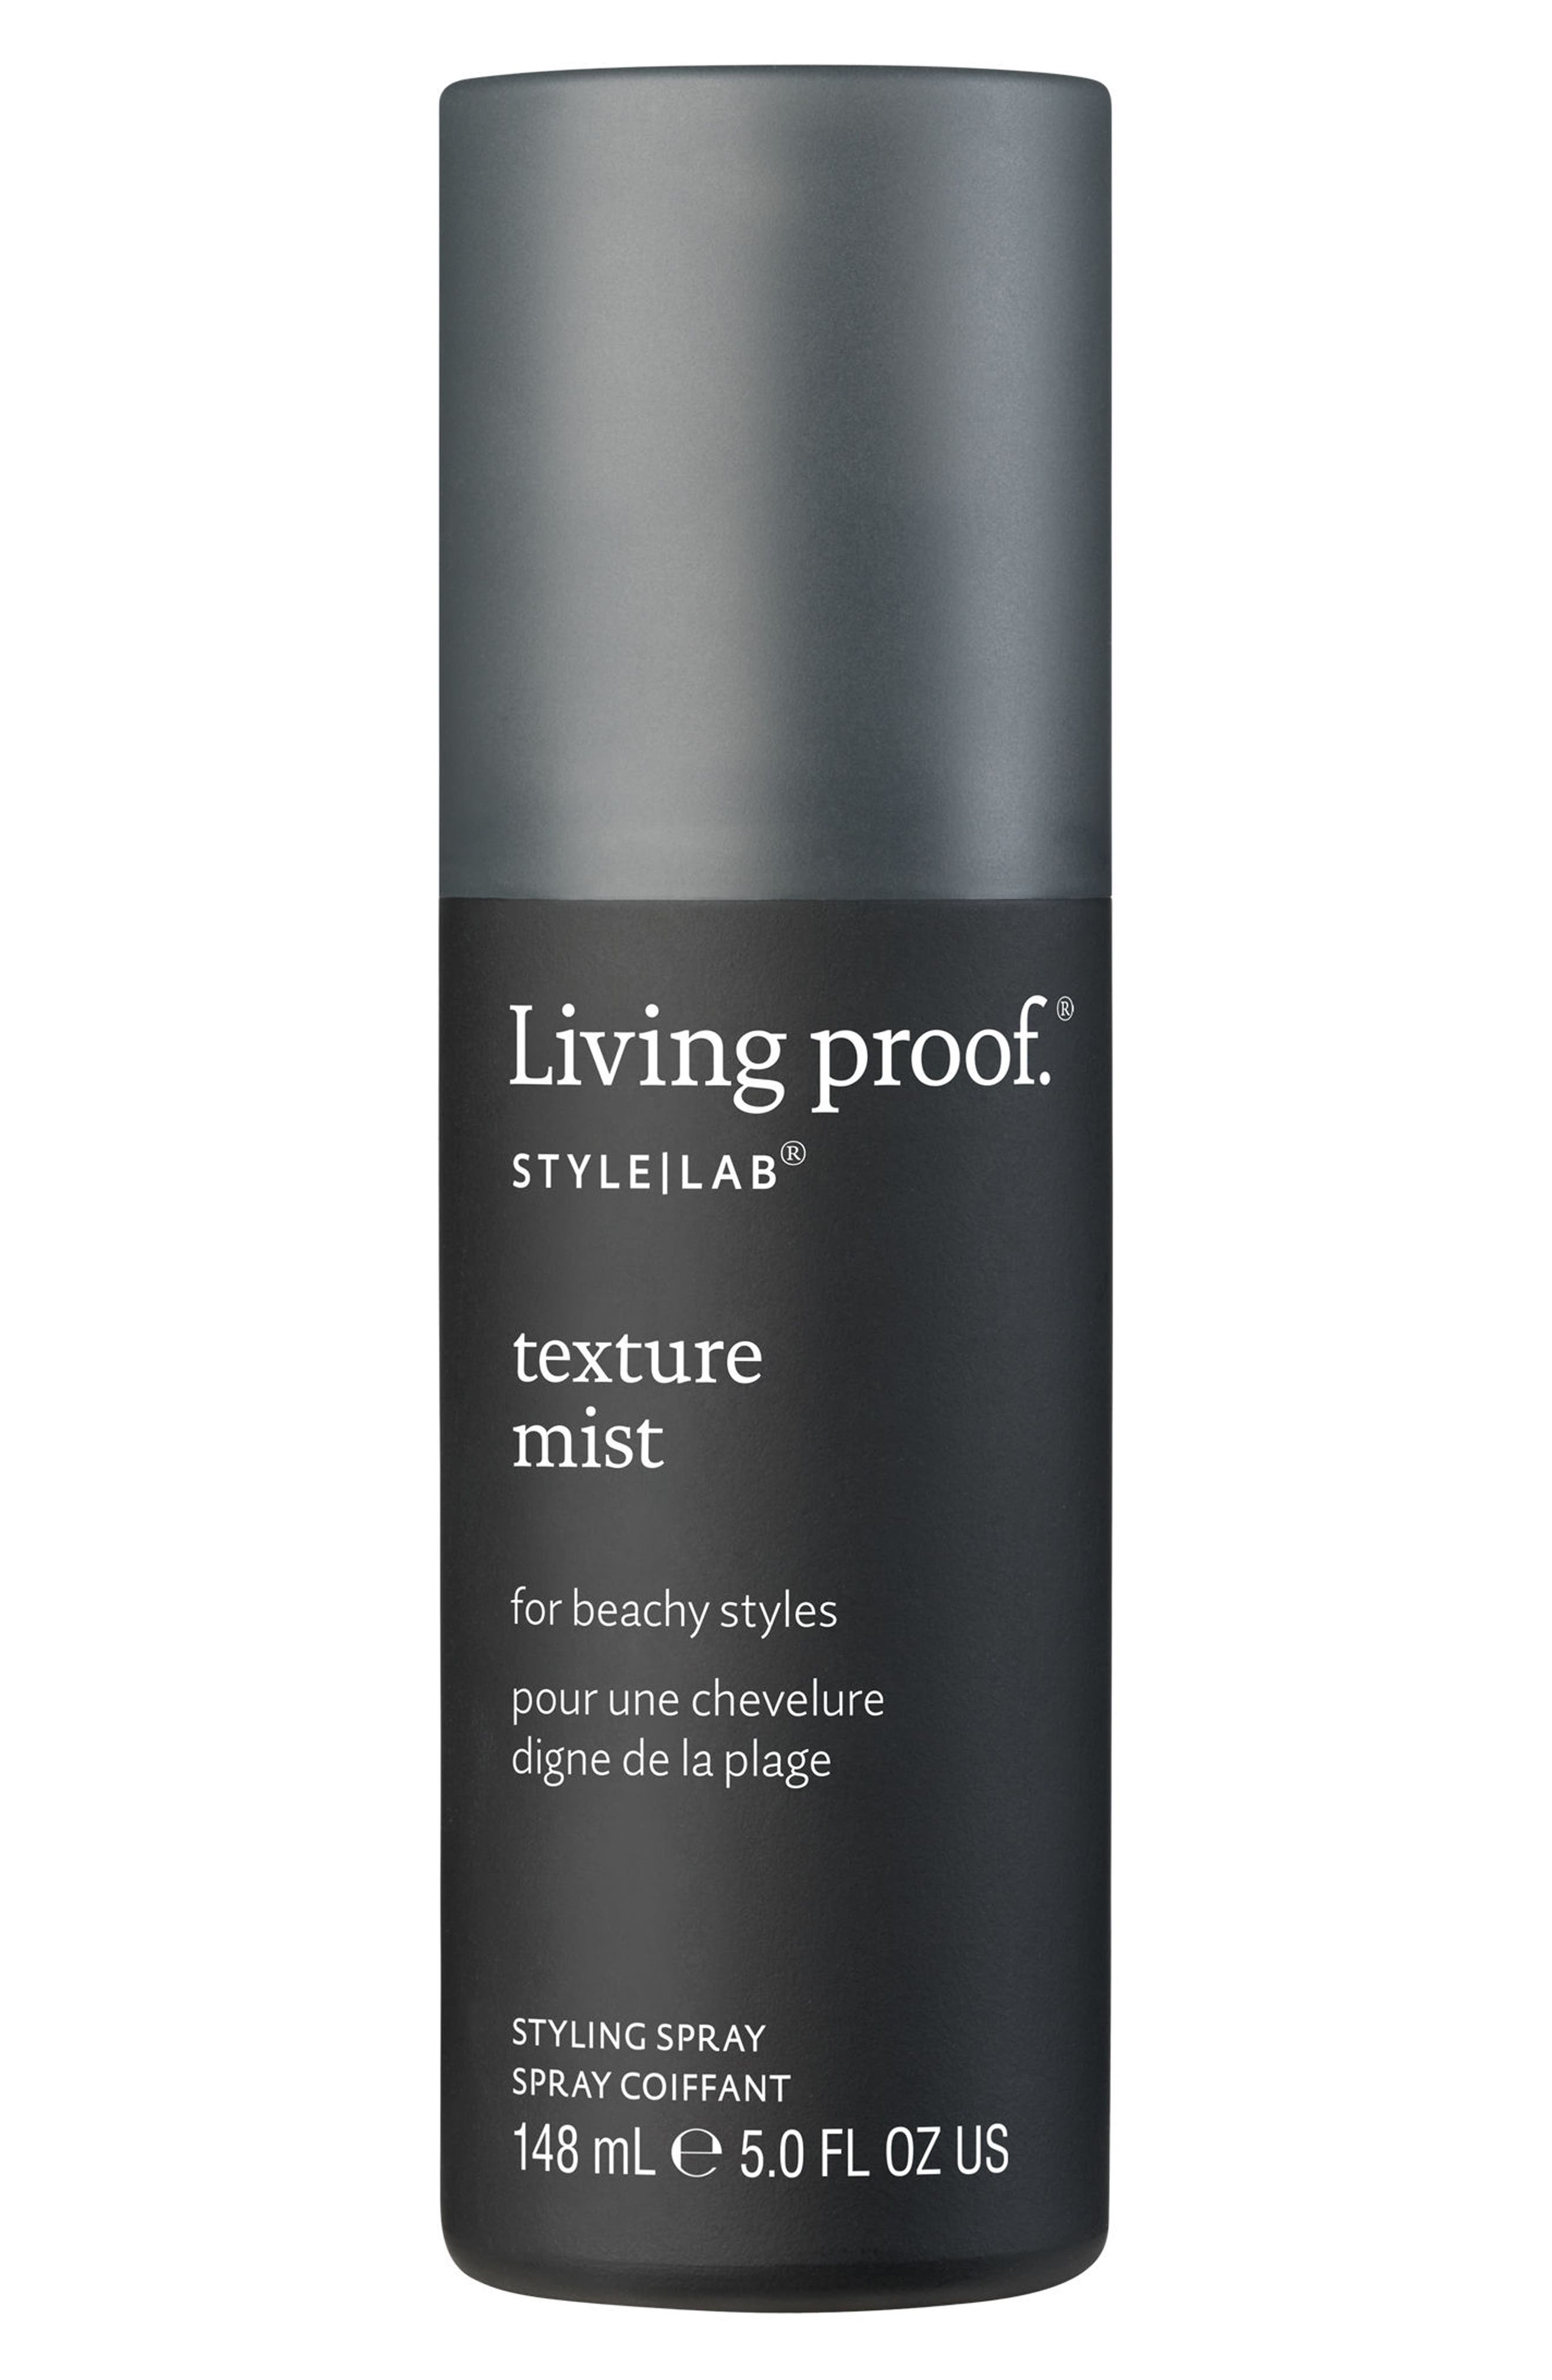 Alternate Image 1 Selected - Living proof® Texture Mist